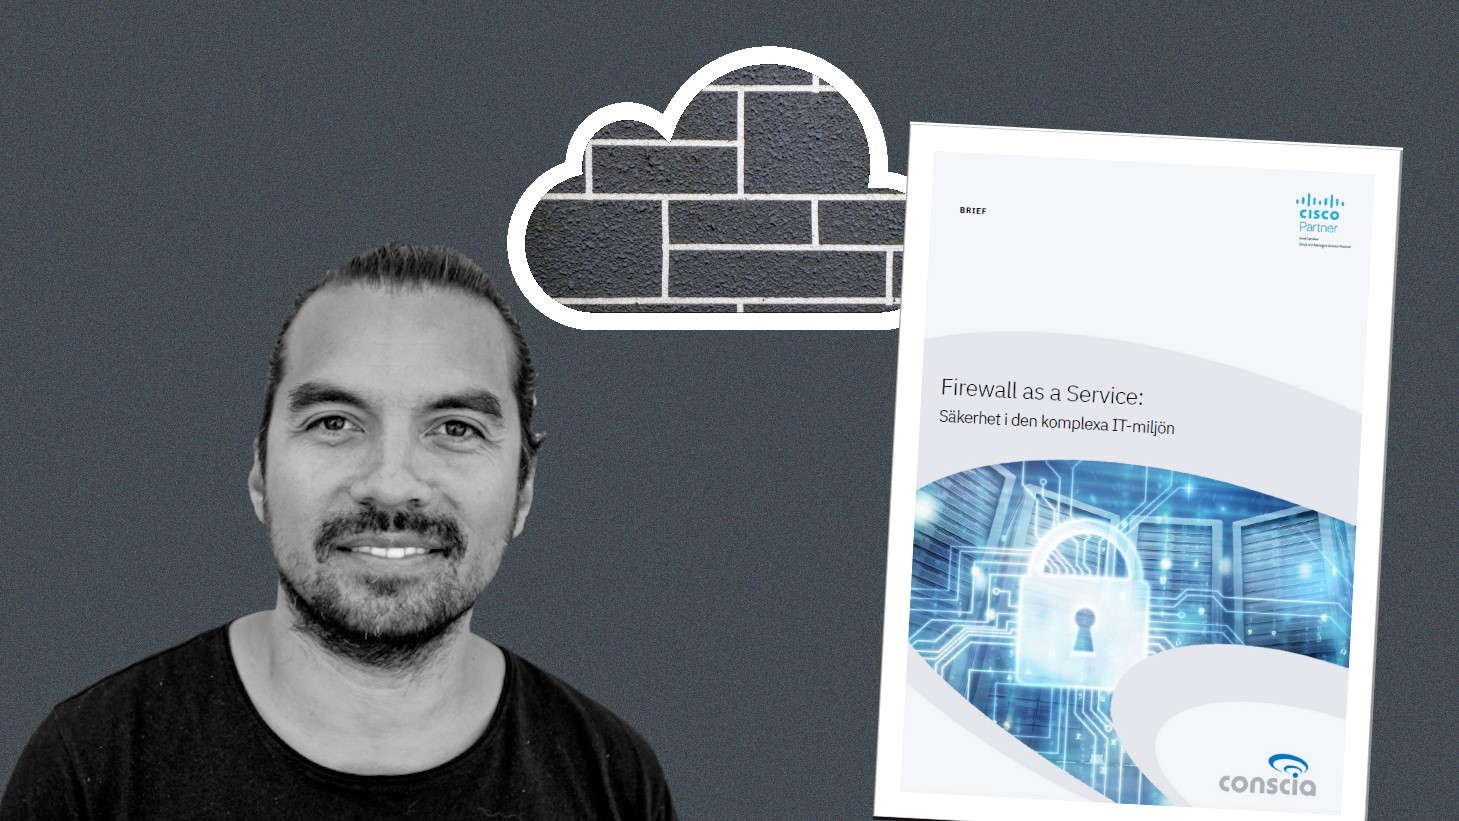 Conscia Firewall as a Service Johnny Haren